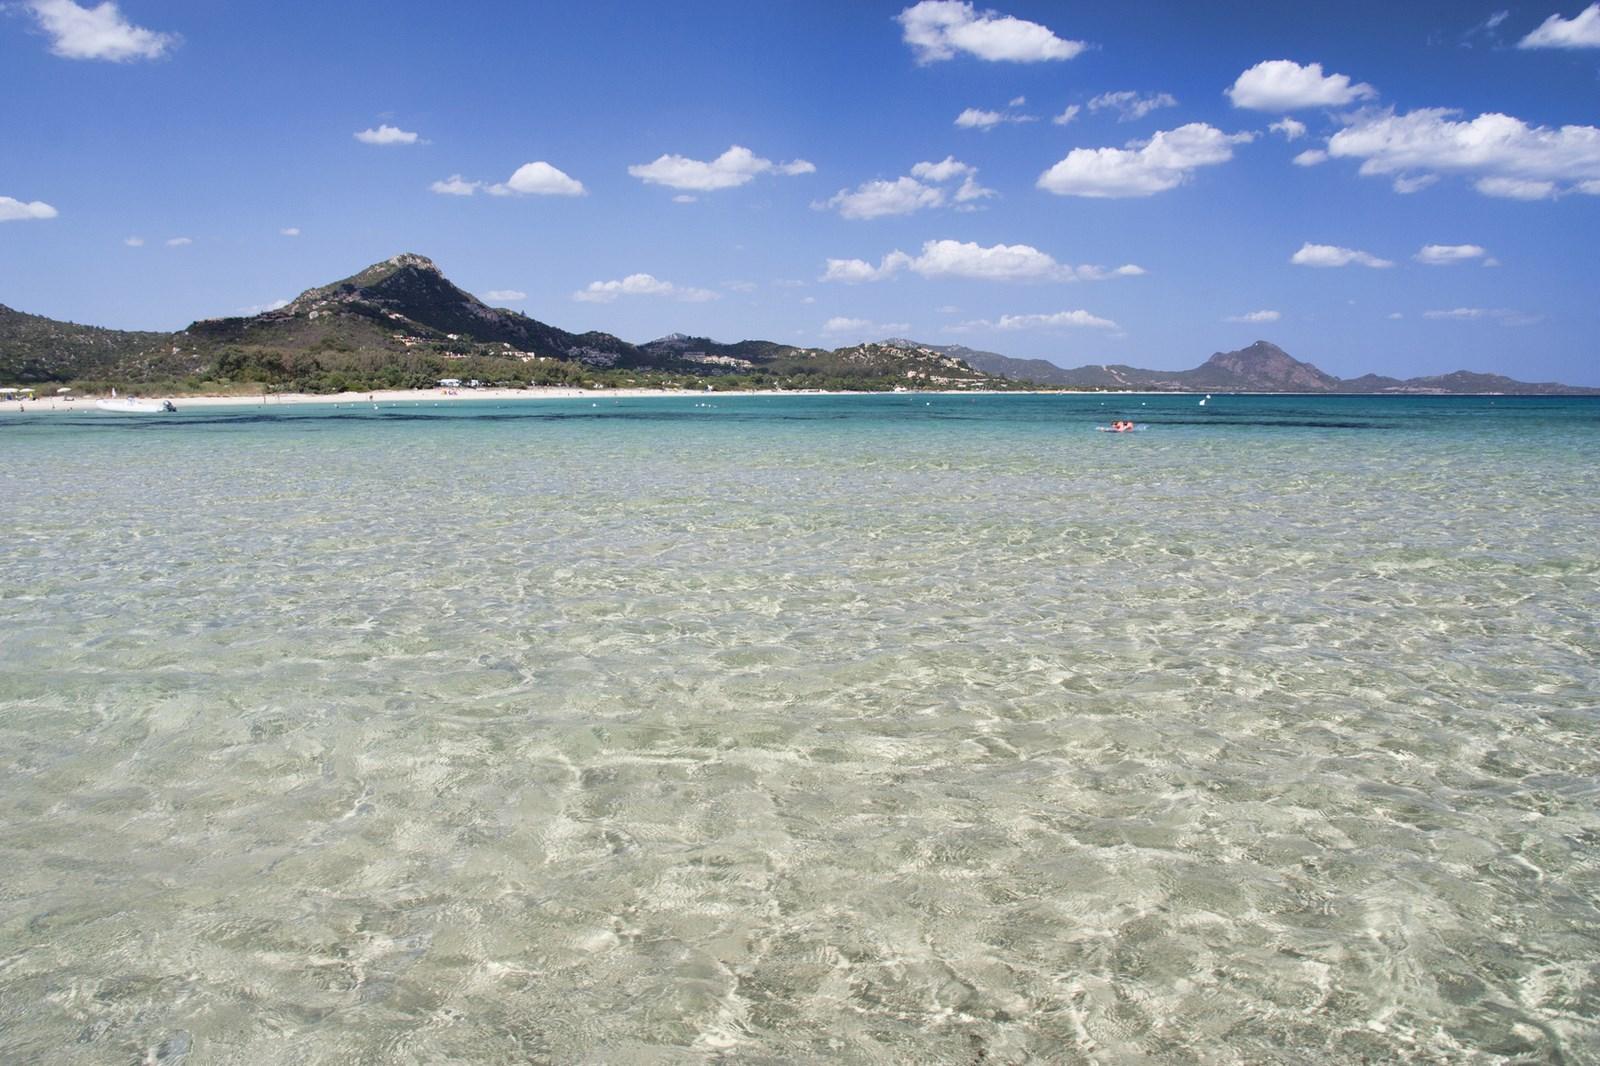 mangiare  spiagge Sardegna...